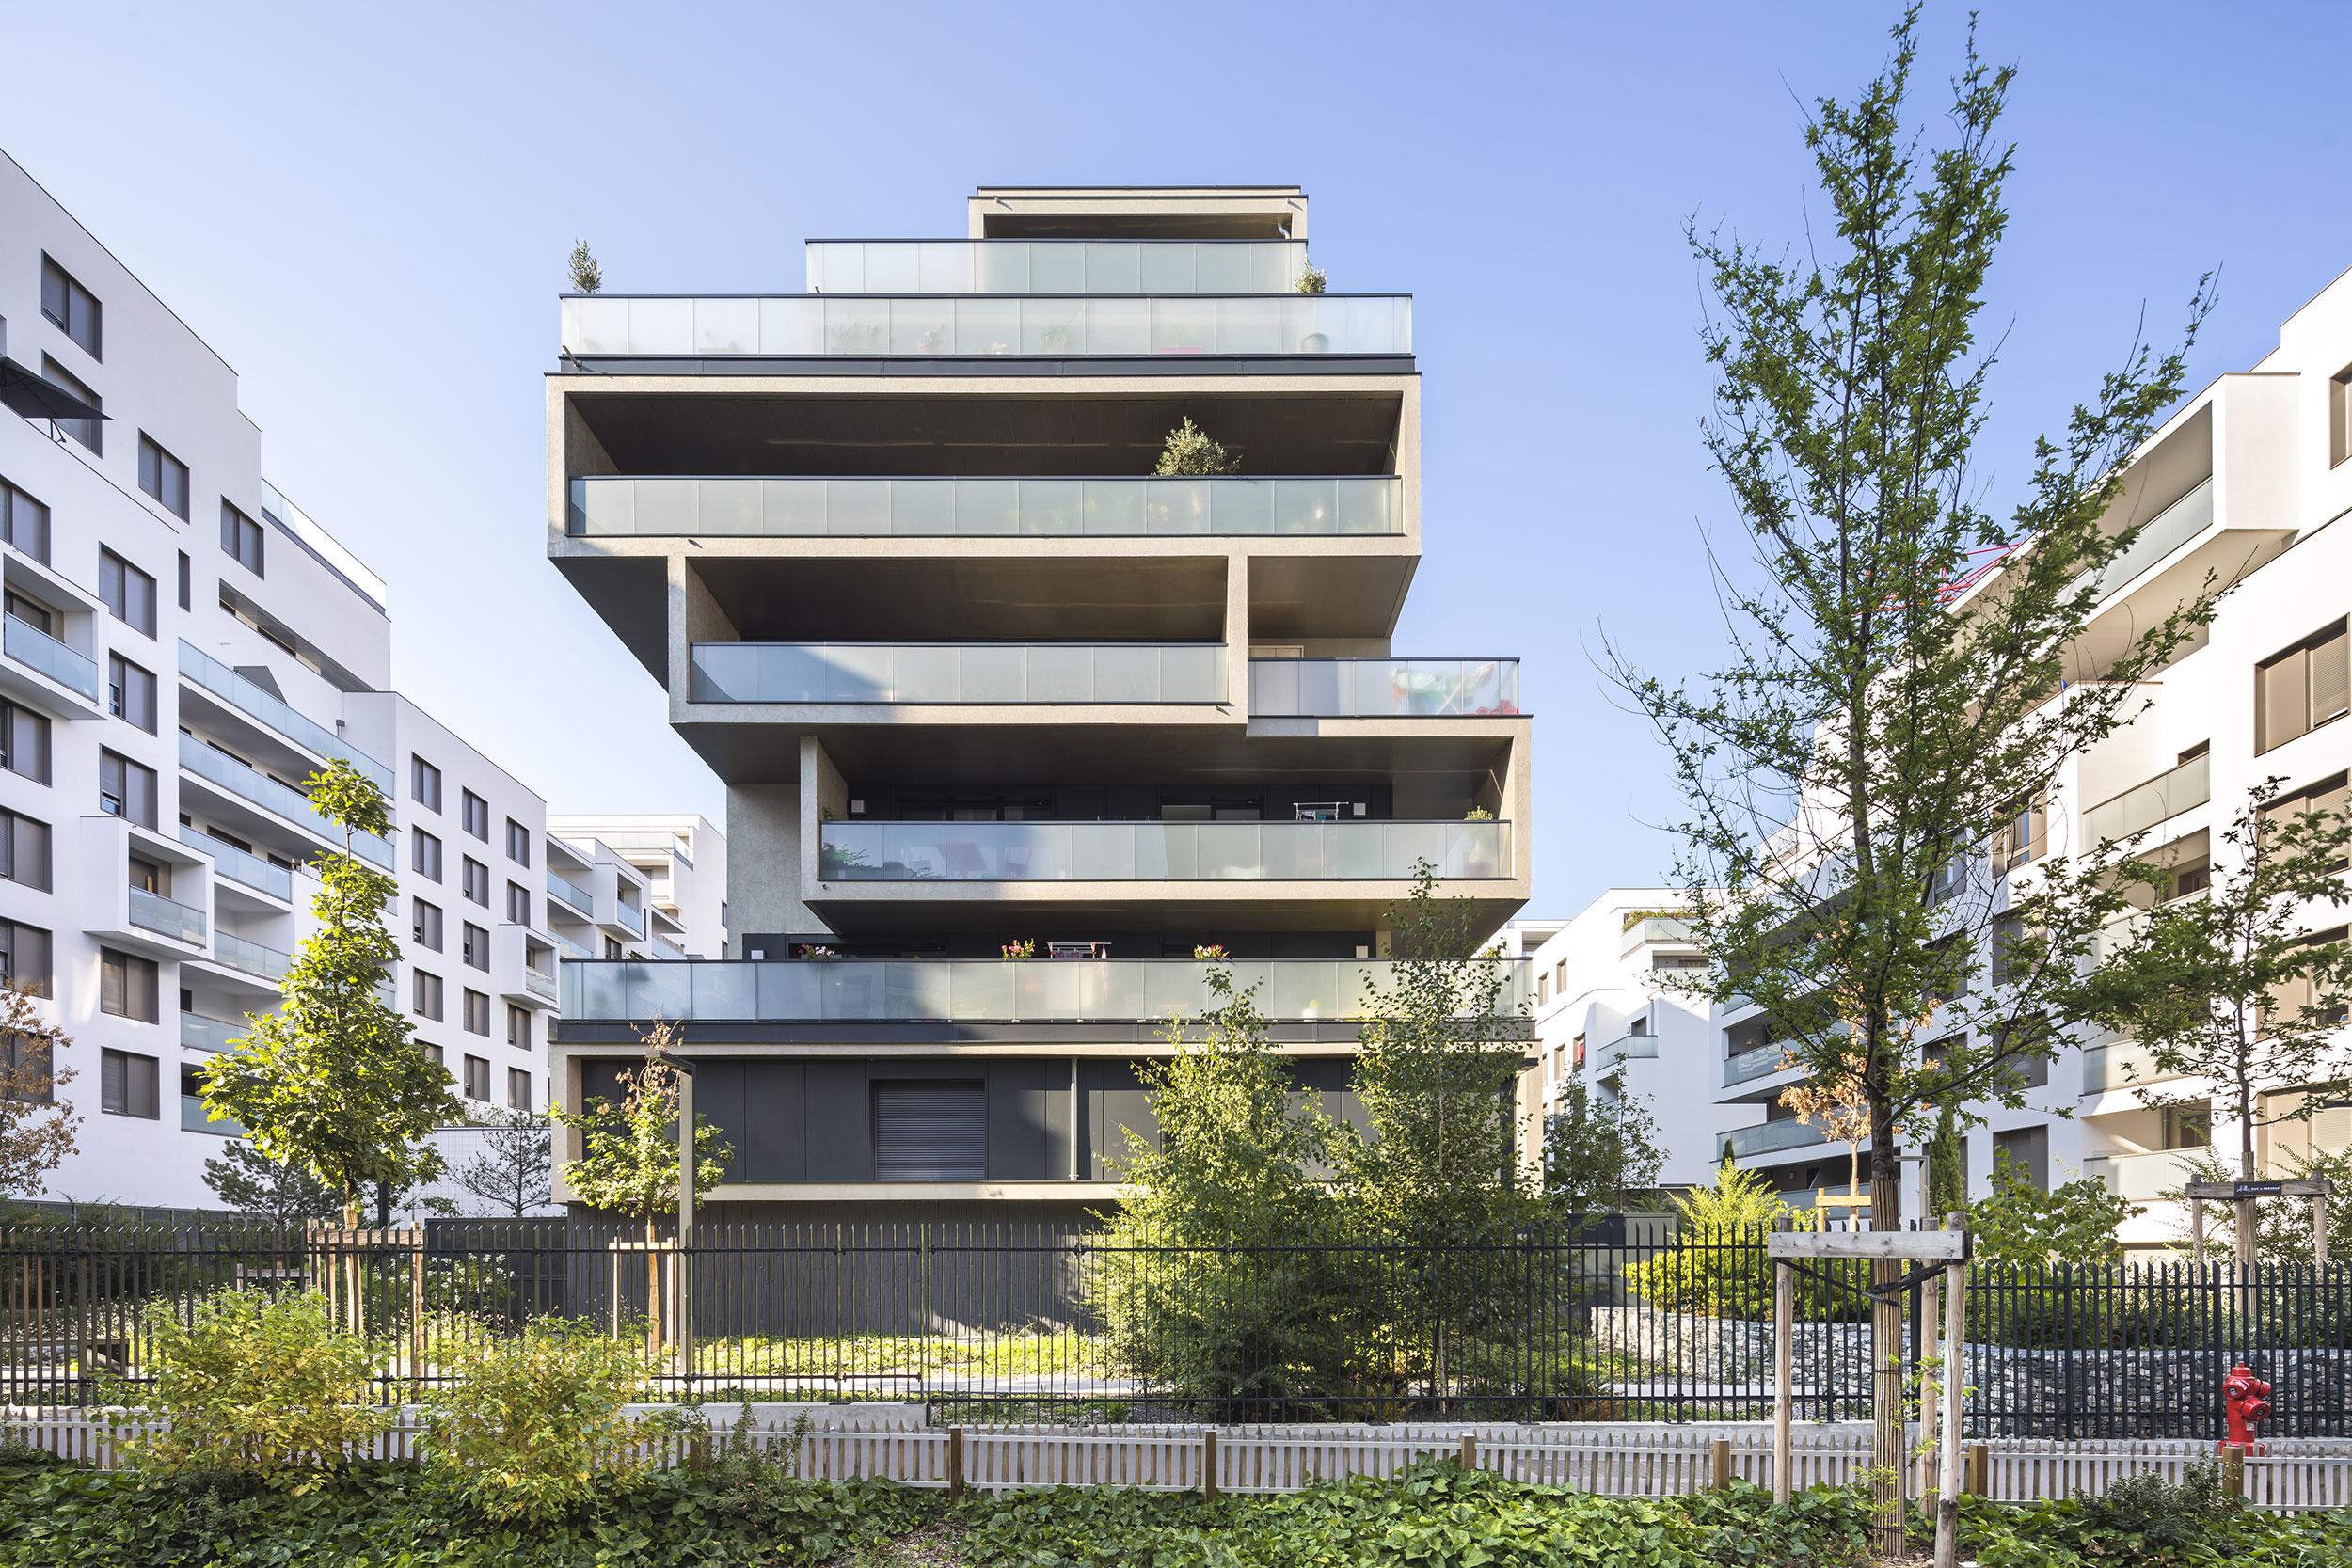 Projet urbain partenarial Berliet à Lyon.  Crédits photographe : Sergio Grazia - Quartier Berliet, Lyon